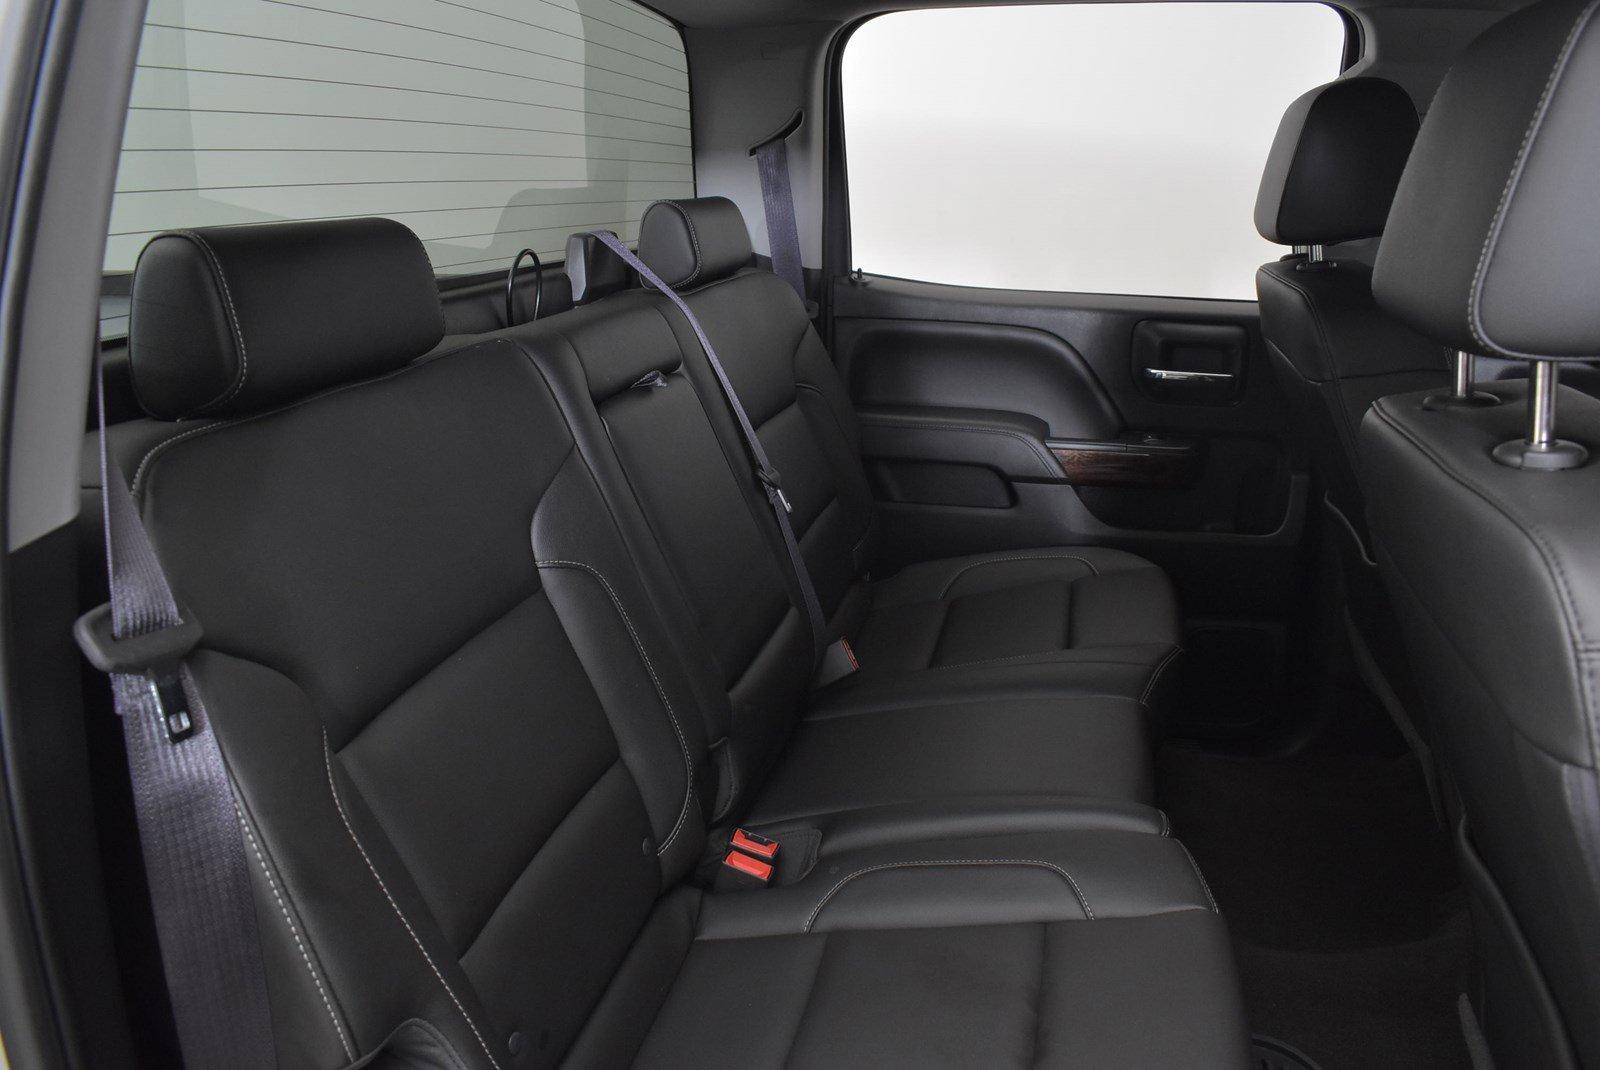 Pre-Owned 2016 GMC Sierra 1500 SLT